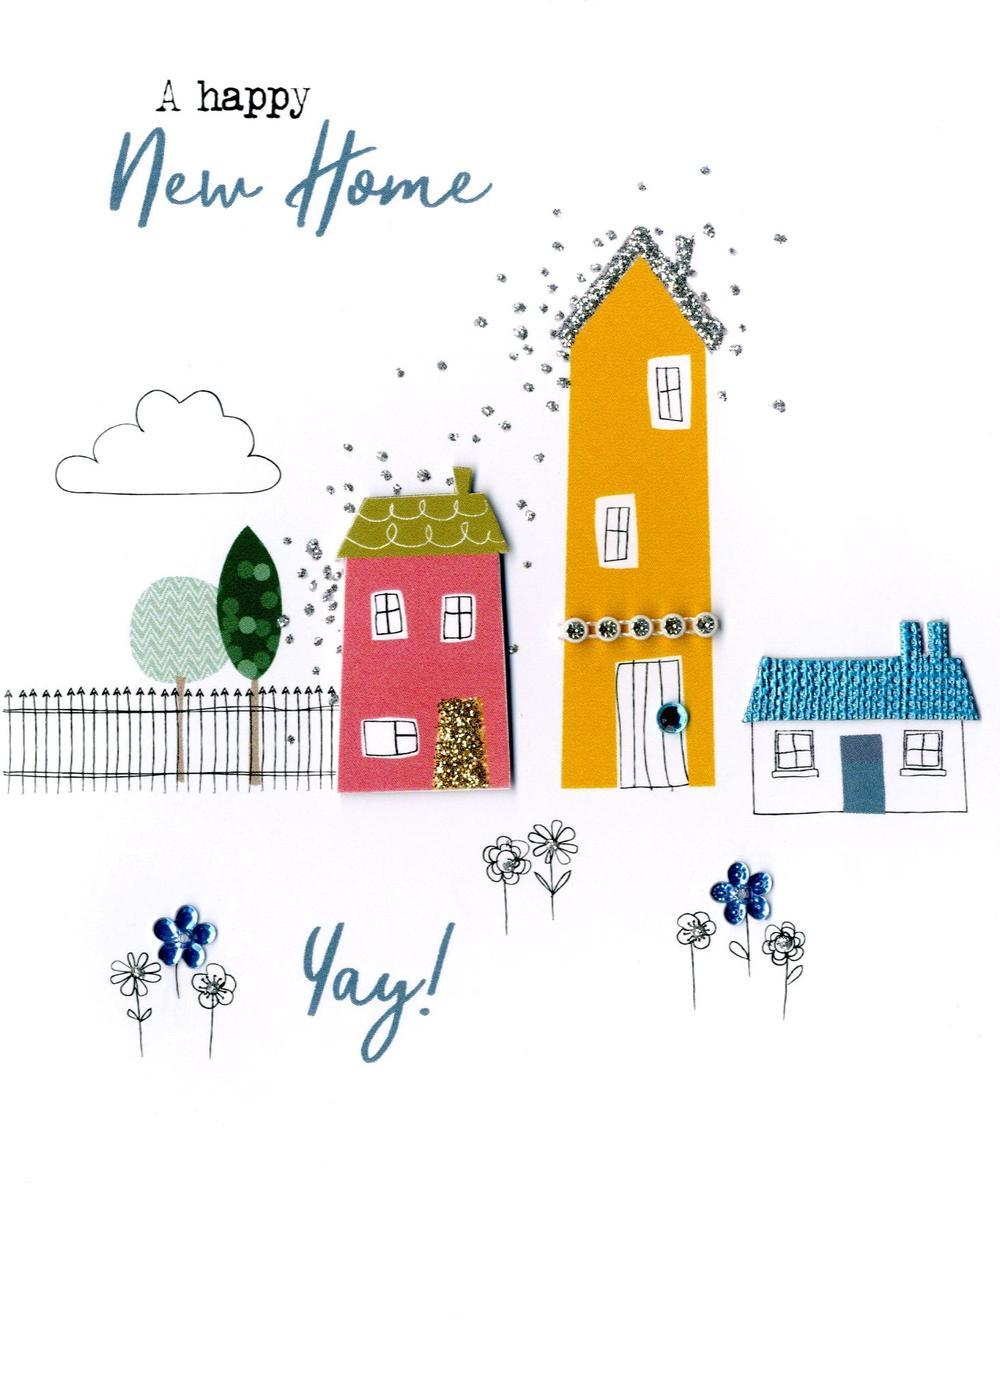 Happy New Home Yay! Irresistible Greeting Card